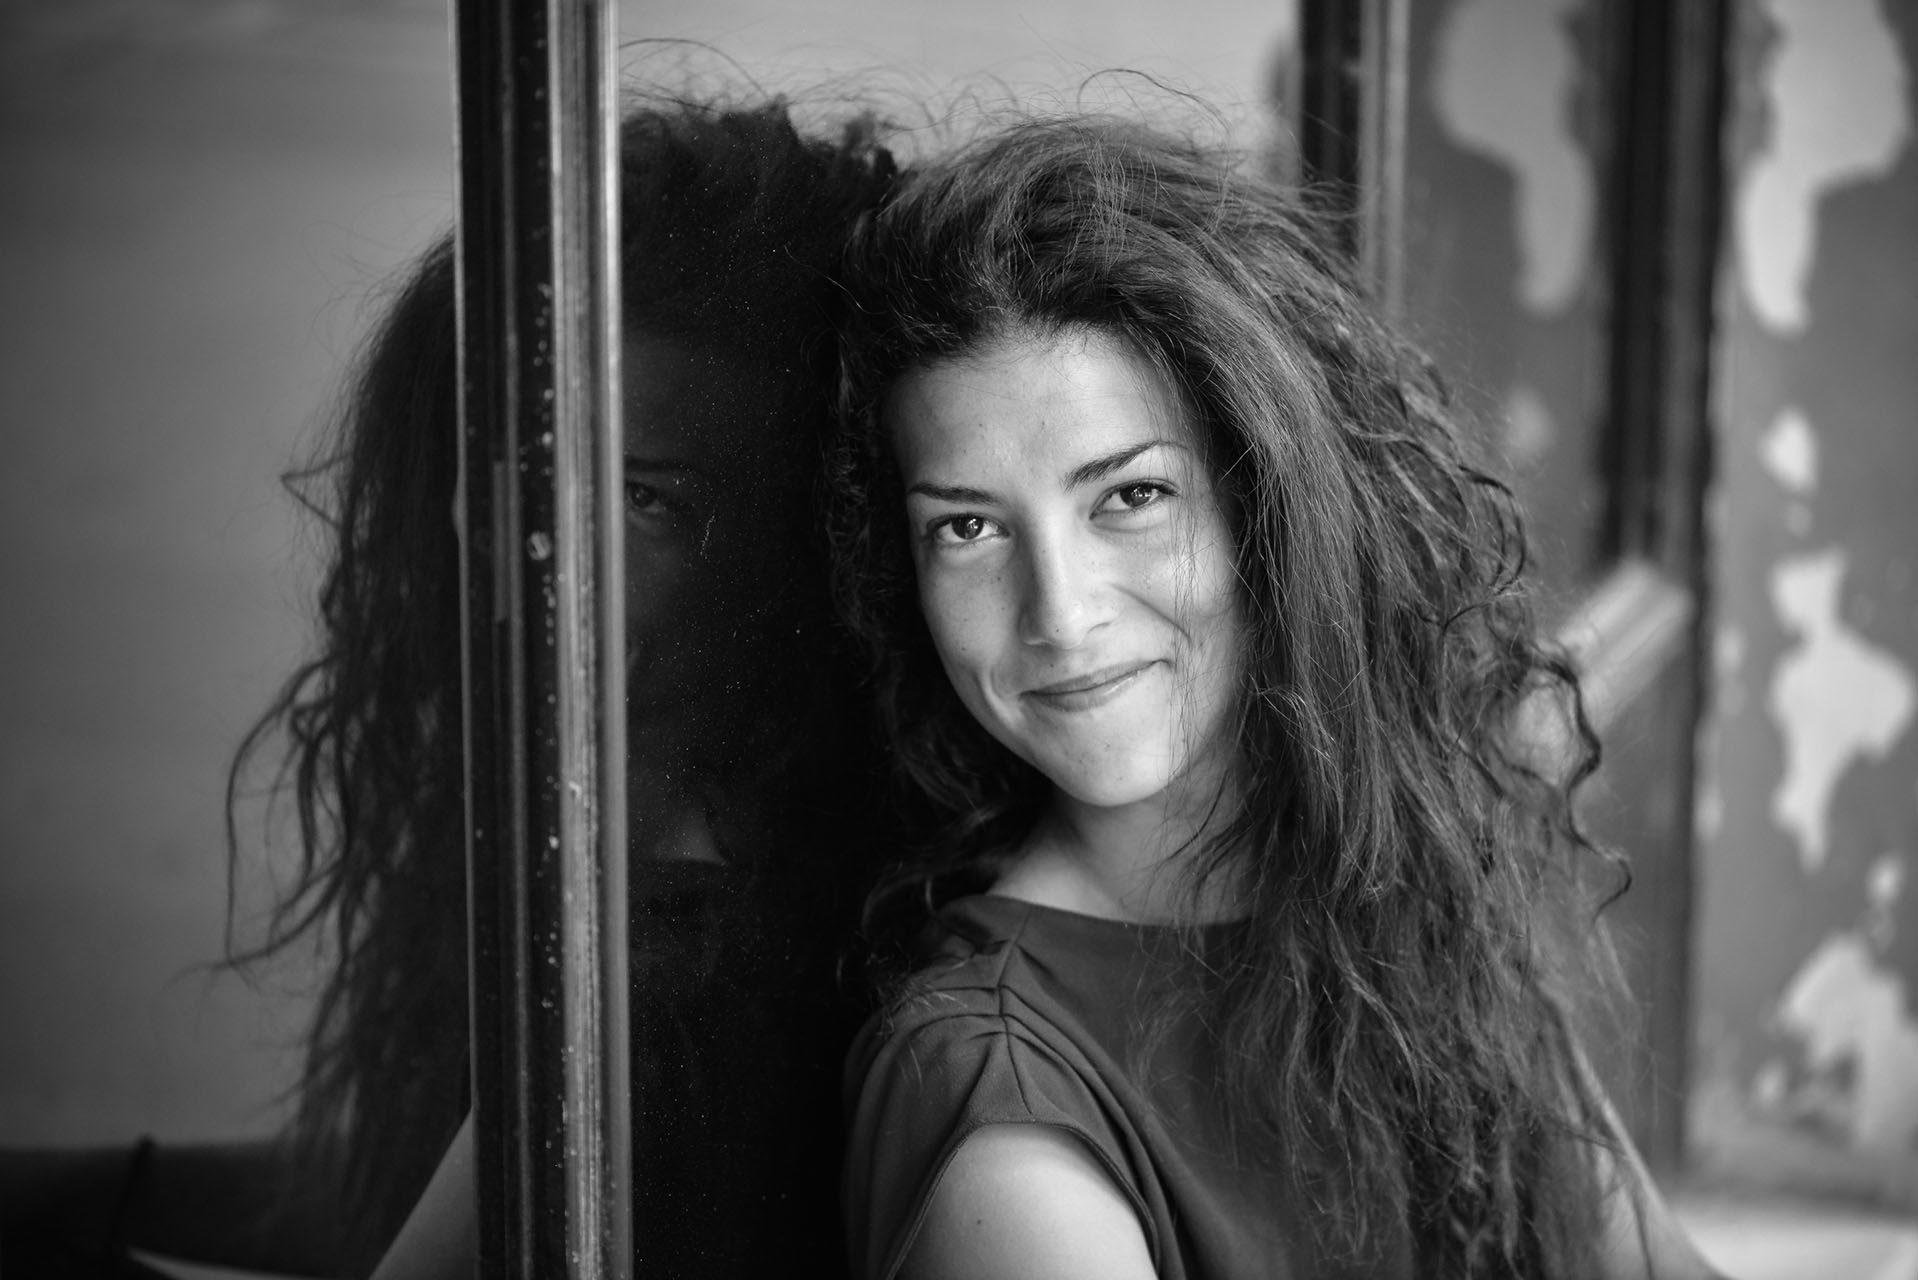 photographe-ile-de-france-portraits-book-comedien-maya-angelsen